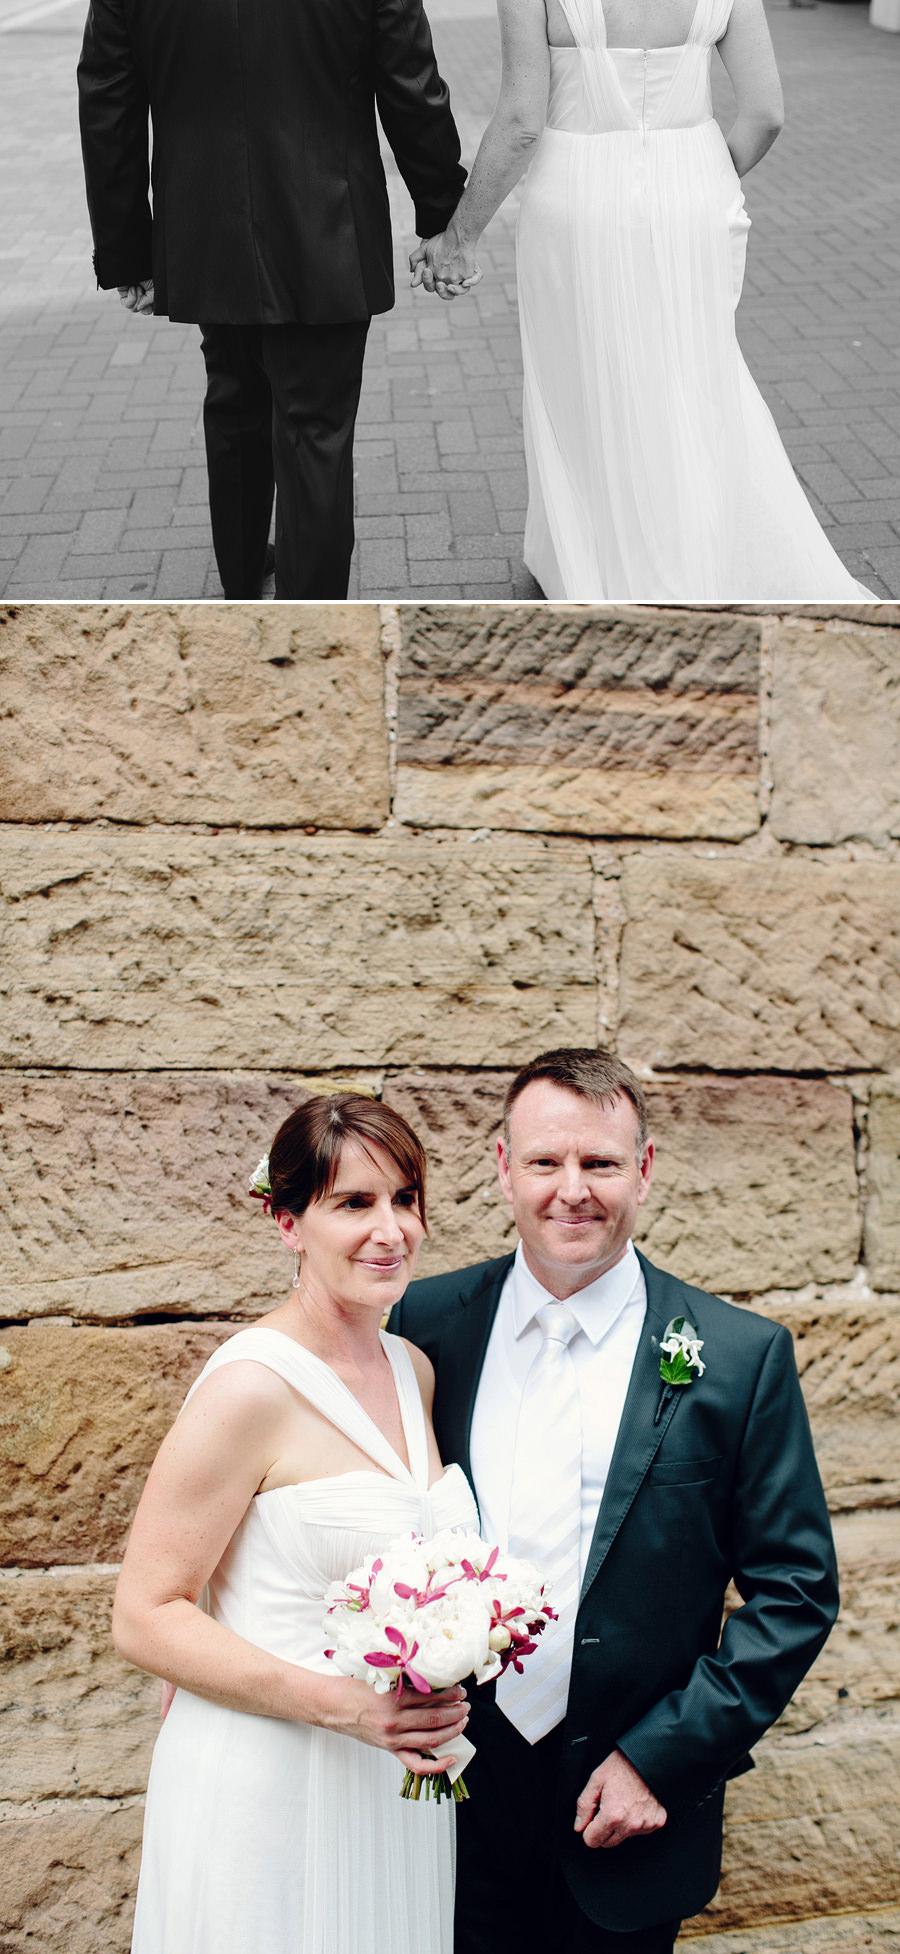 Sydney Wedding Photography: The Rocks first look